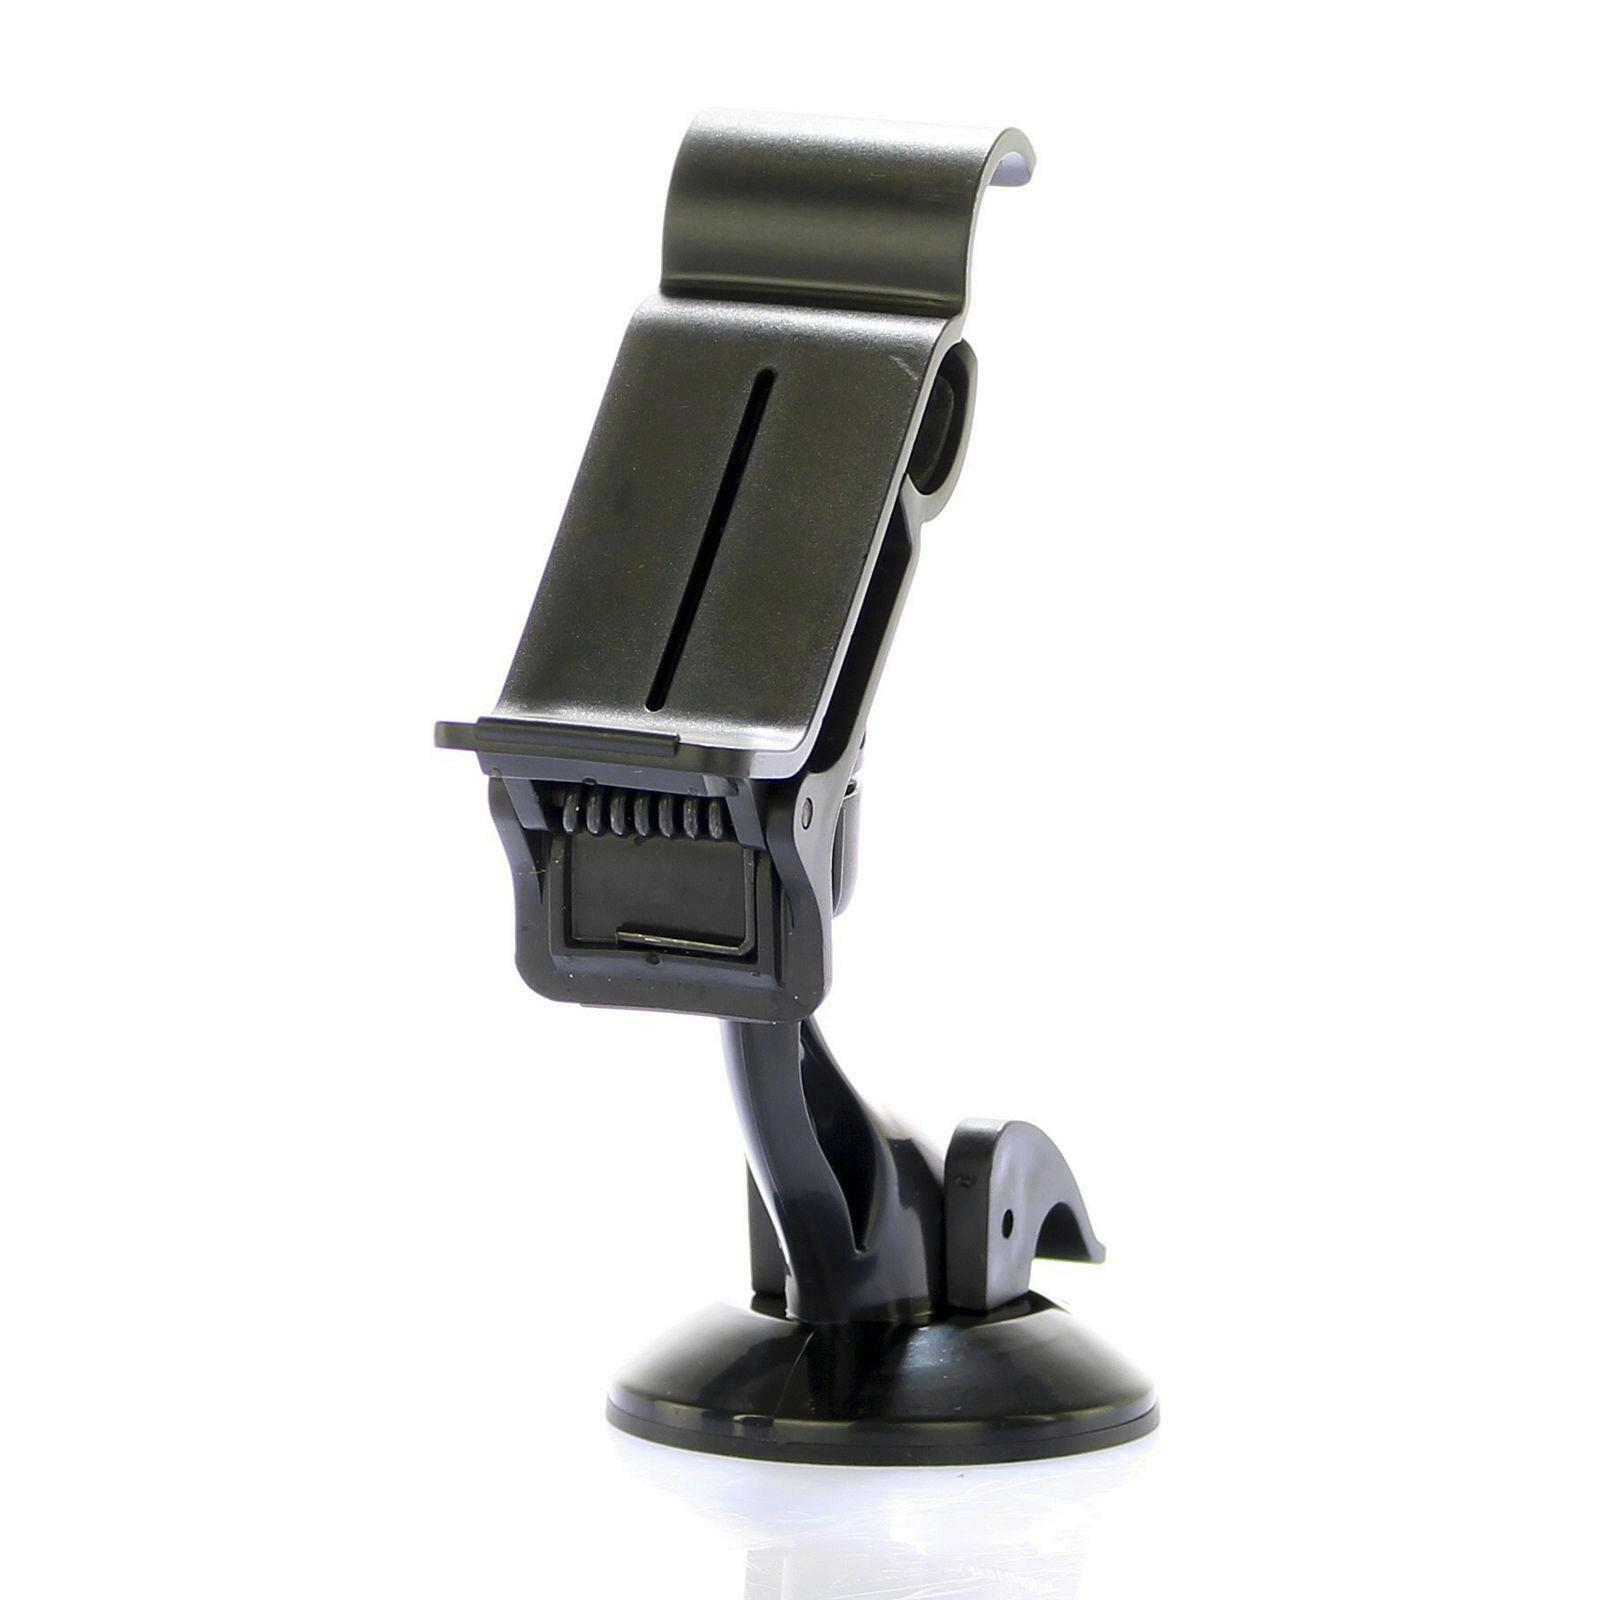 universal kfz auto handy halterung halter mit saugnapf f r. Black Bedroom Furniture Sets. Home Design Ideas